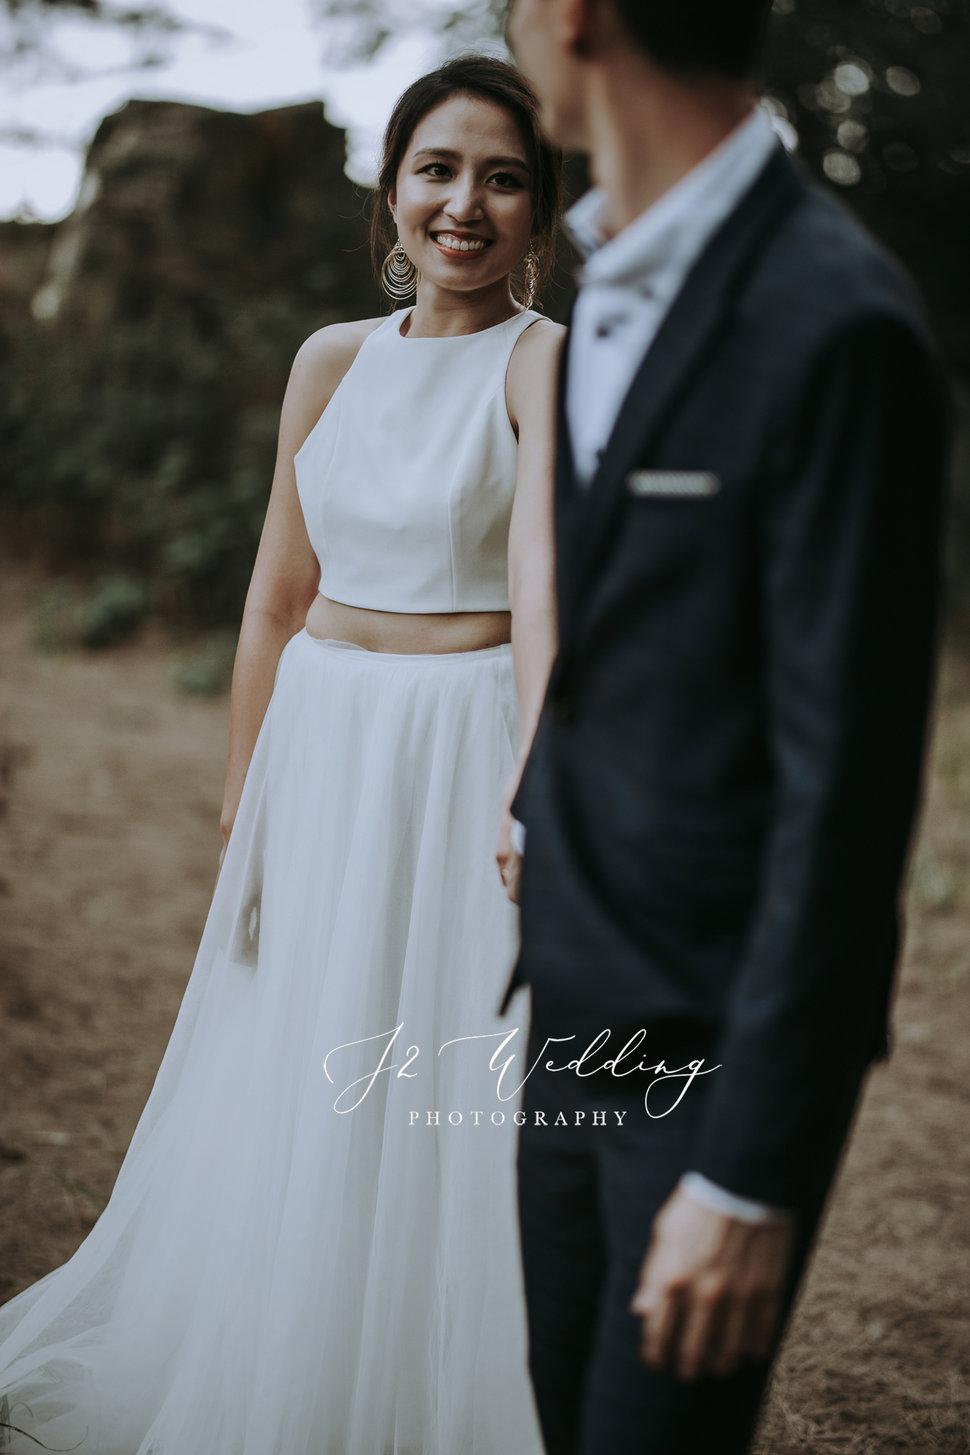 069A1288 - J2 wedding 中壢《結婚吧》